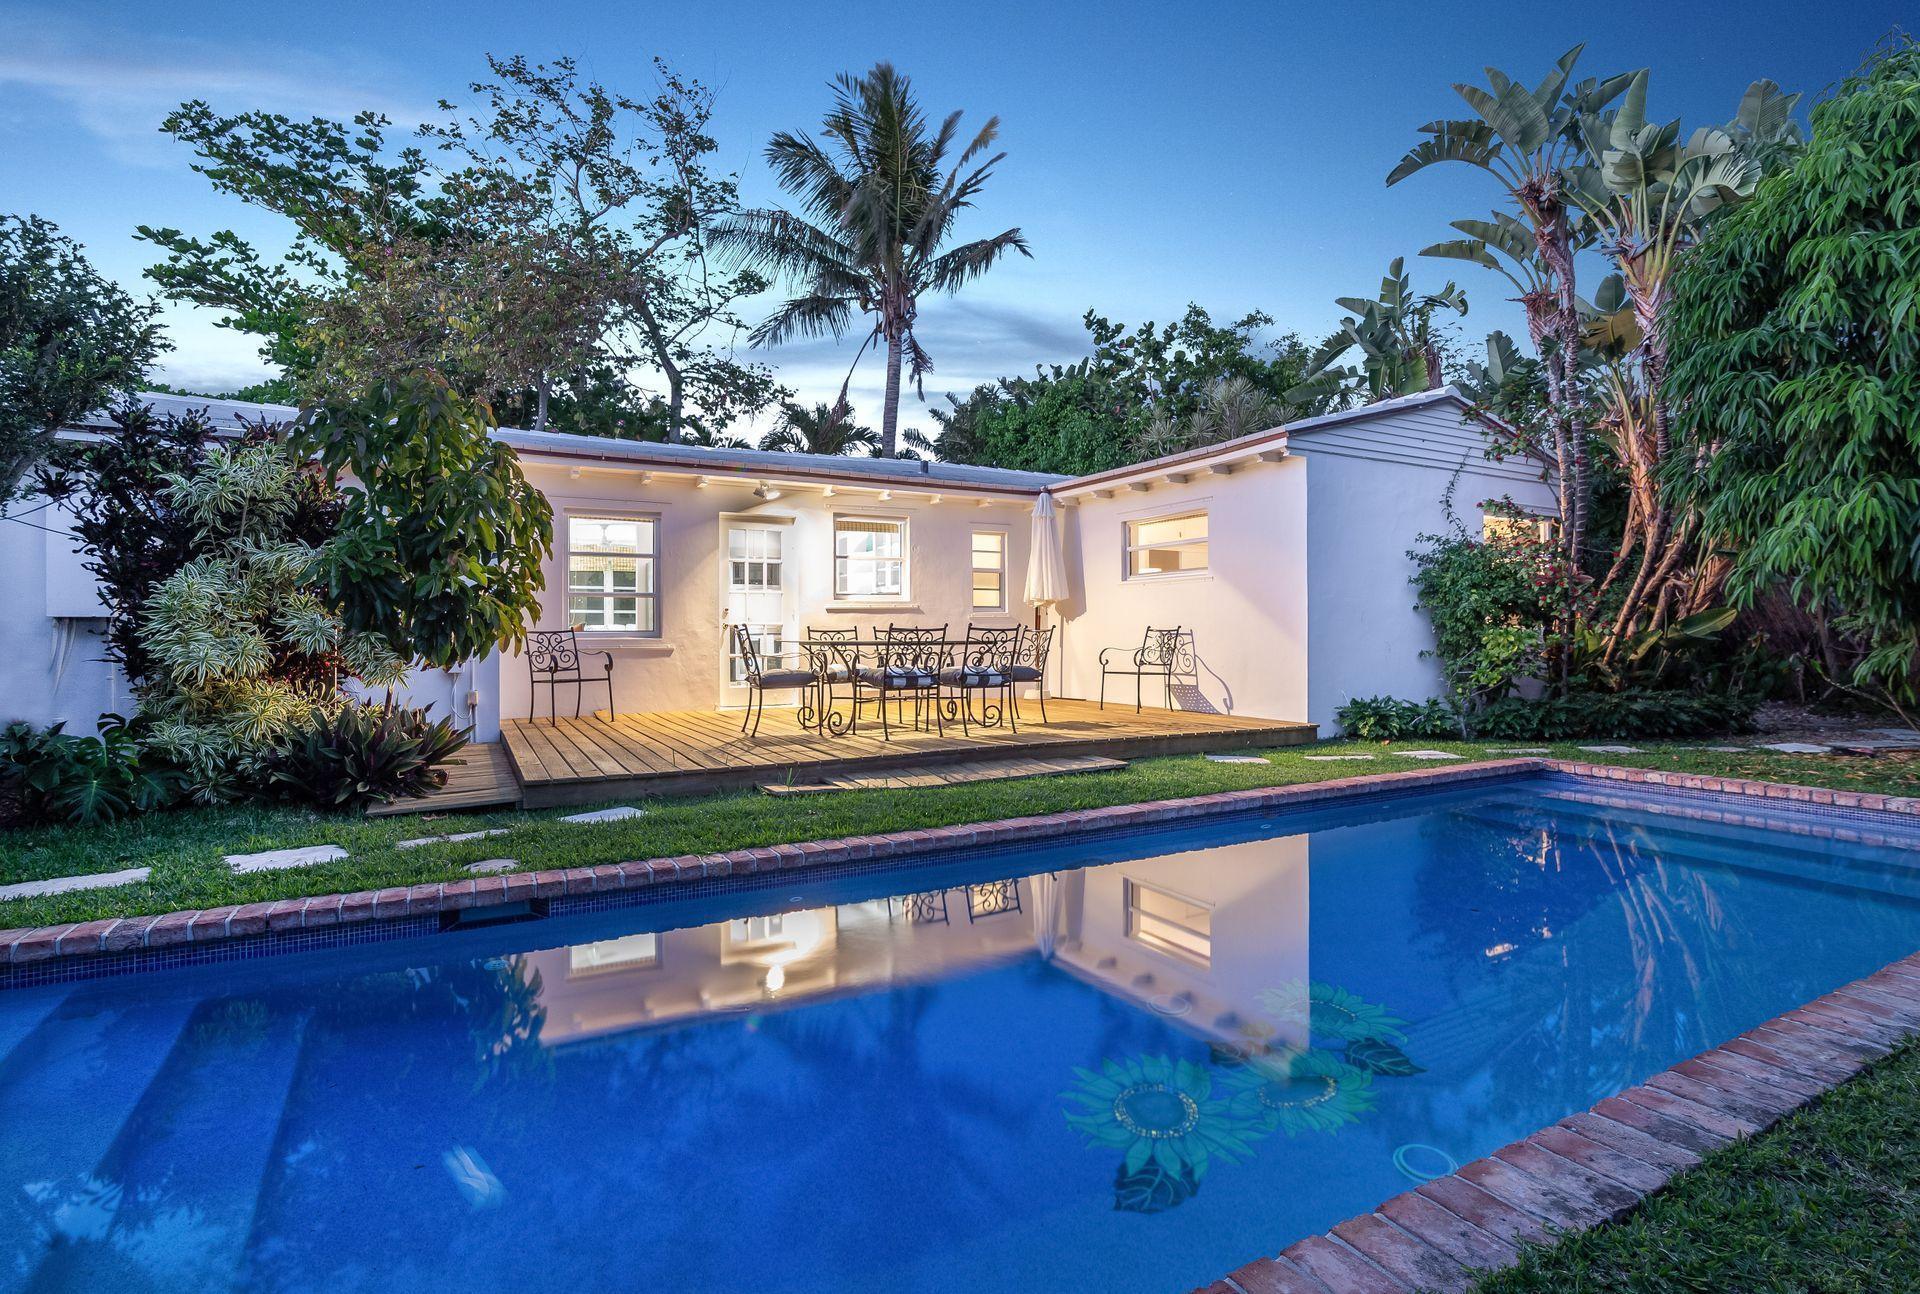 210 Debra Lane, Palm Beach, Florida 33480, 3 Bedrooms Bedrooms, ,2 BathroomsBathrooms,Single Family,For Rent,Debra,RX-10437978